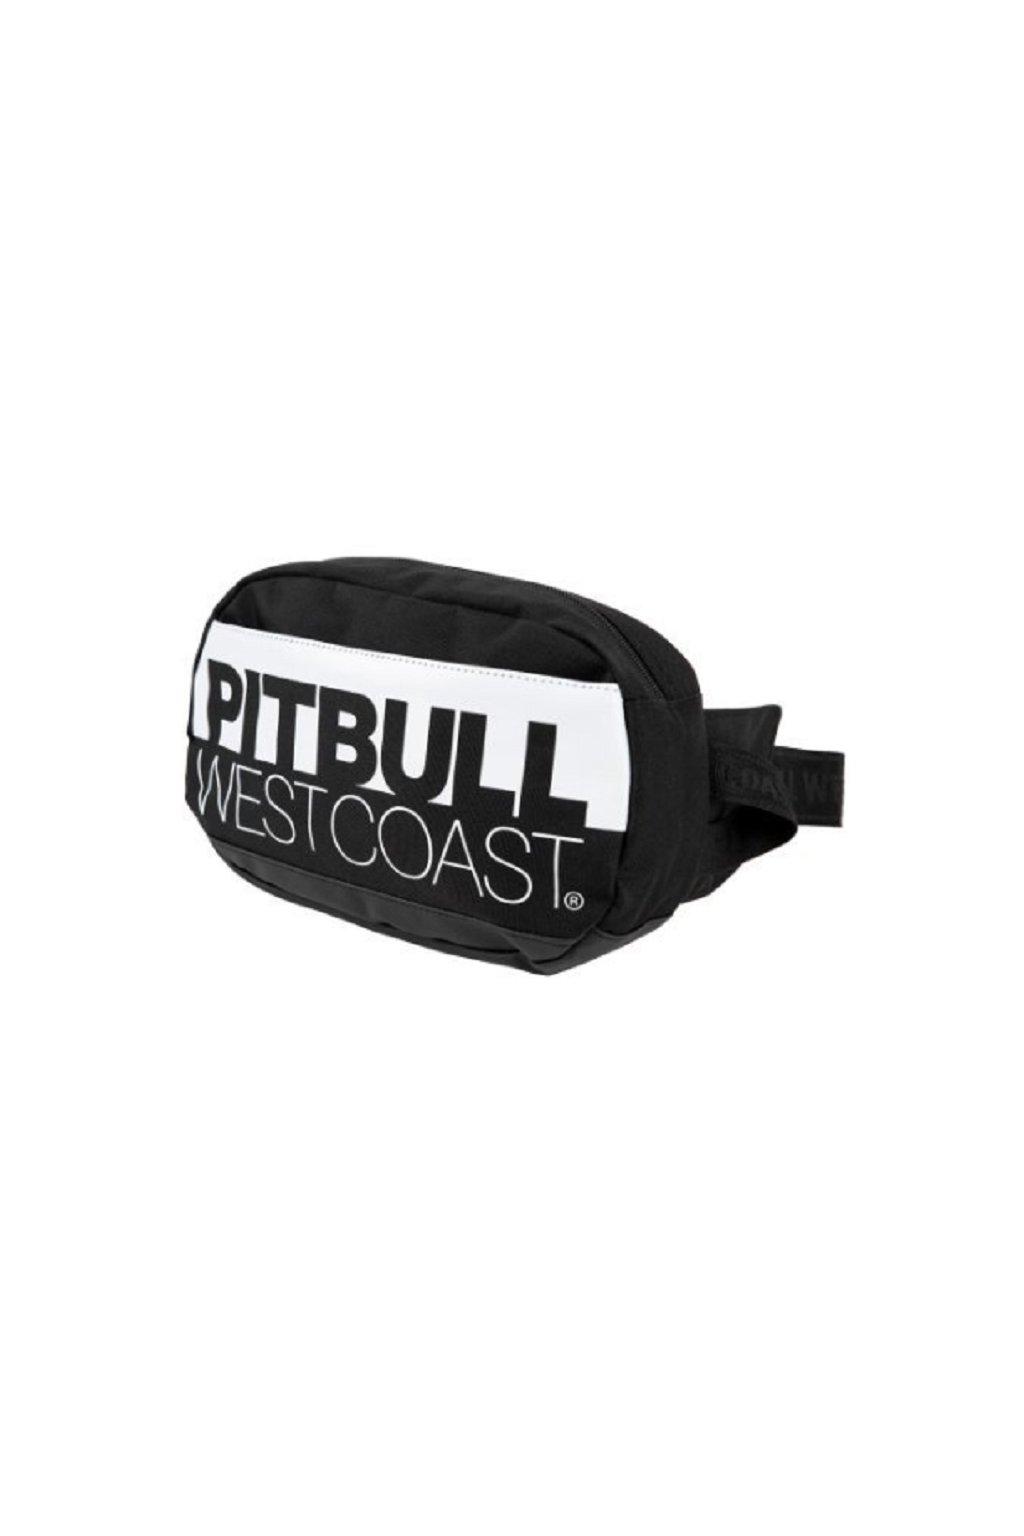 PitBull West Coast - Ledvinka TNT černo/bílá obr1